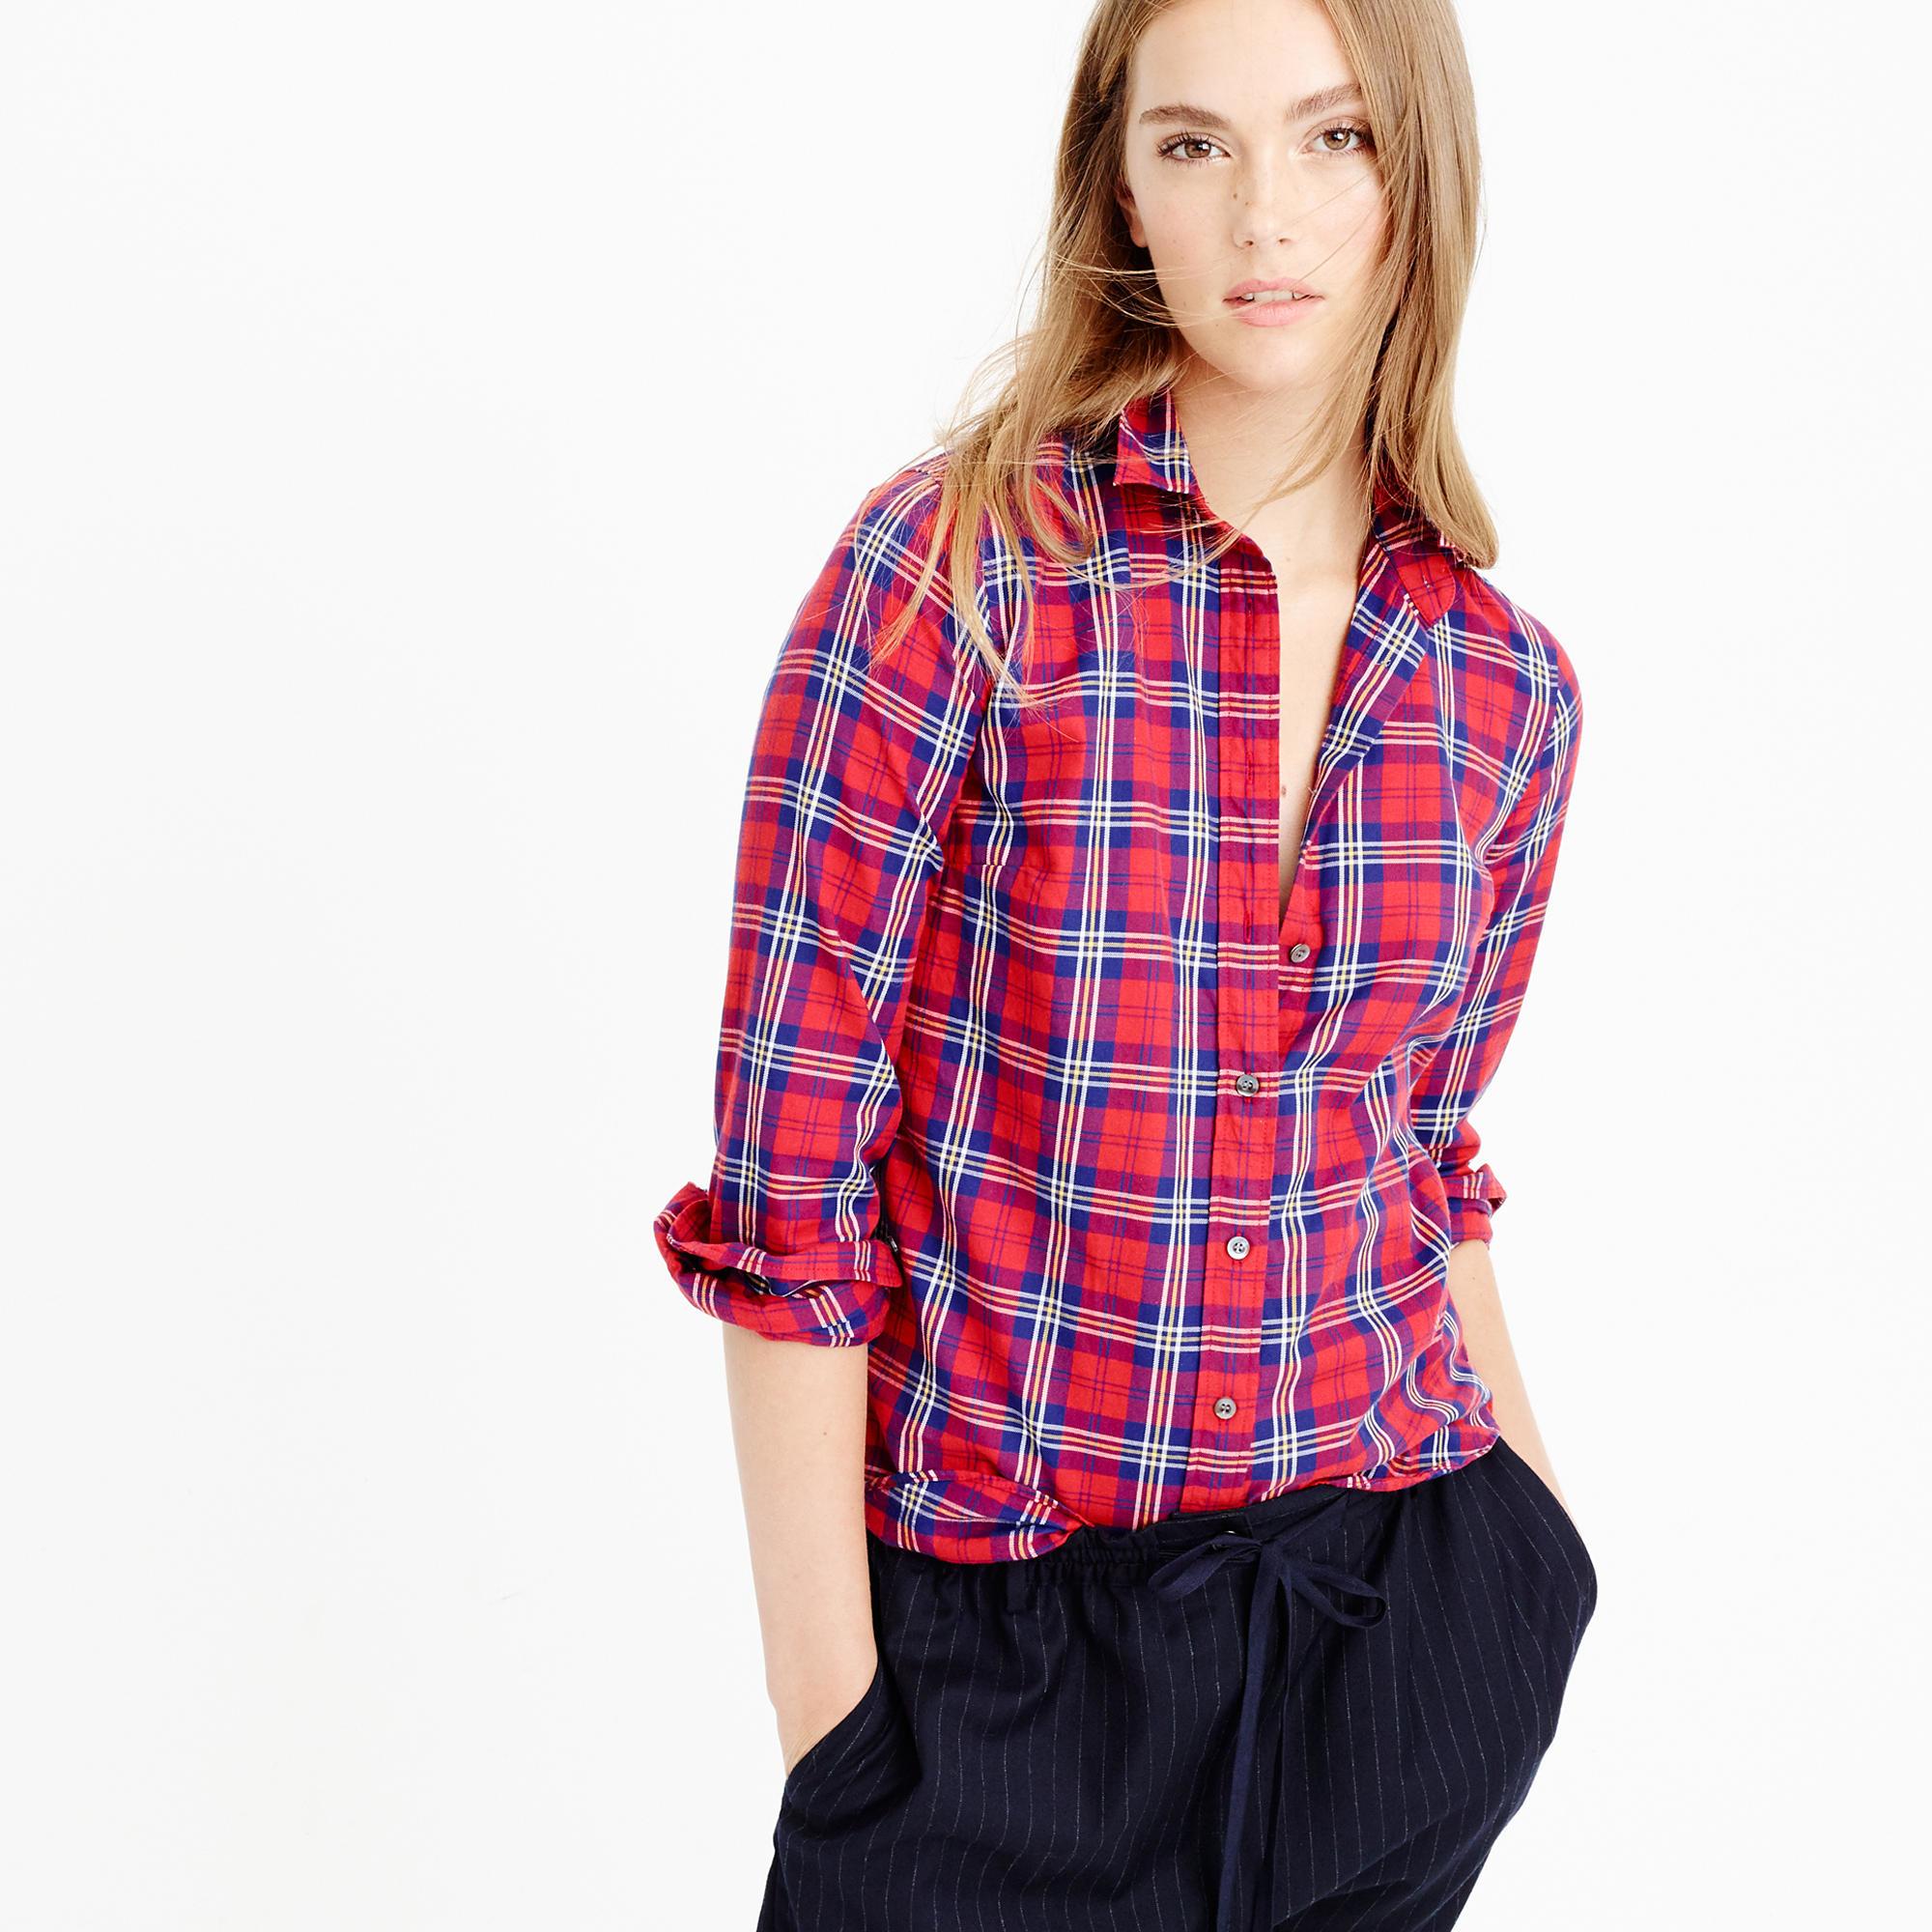 Lyst - J.Crew Thomas Mason Flannel Shirt In Festive Plaid in Red 1782d7786